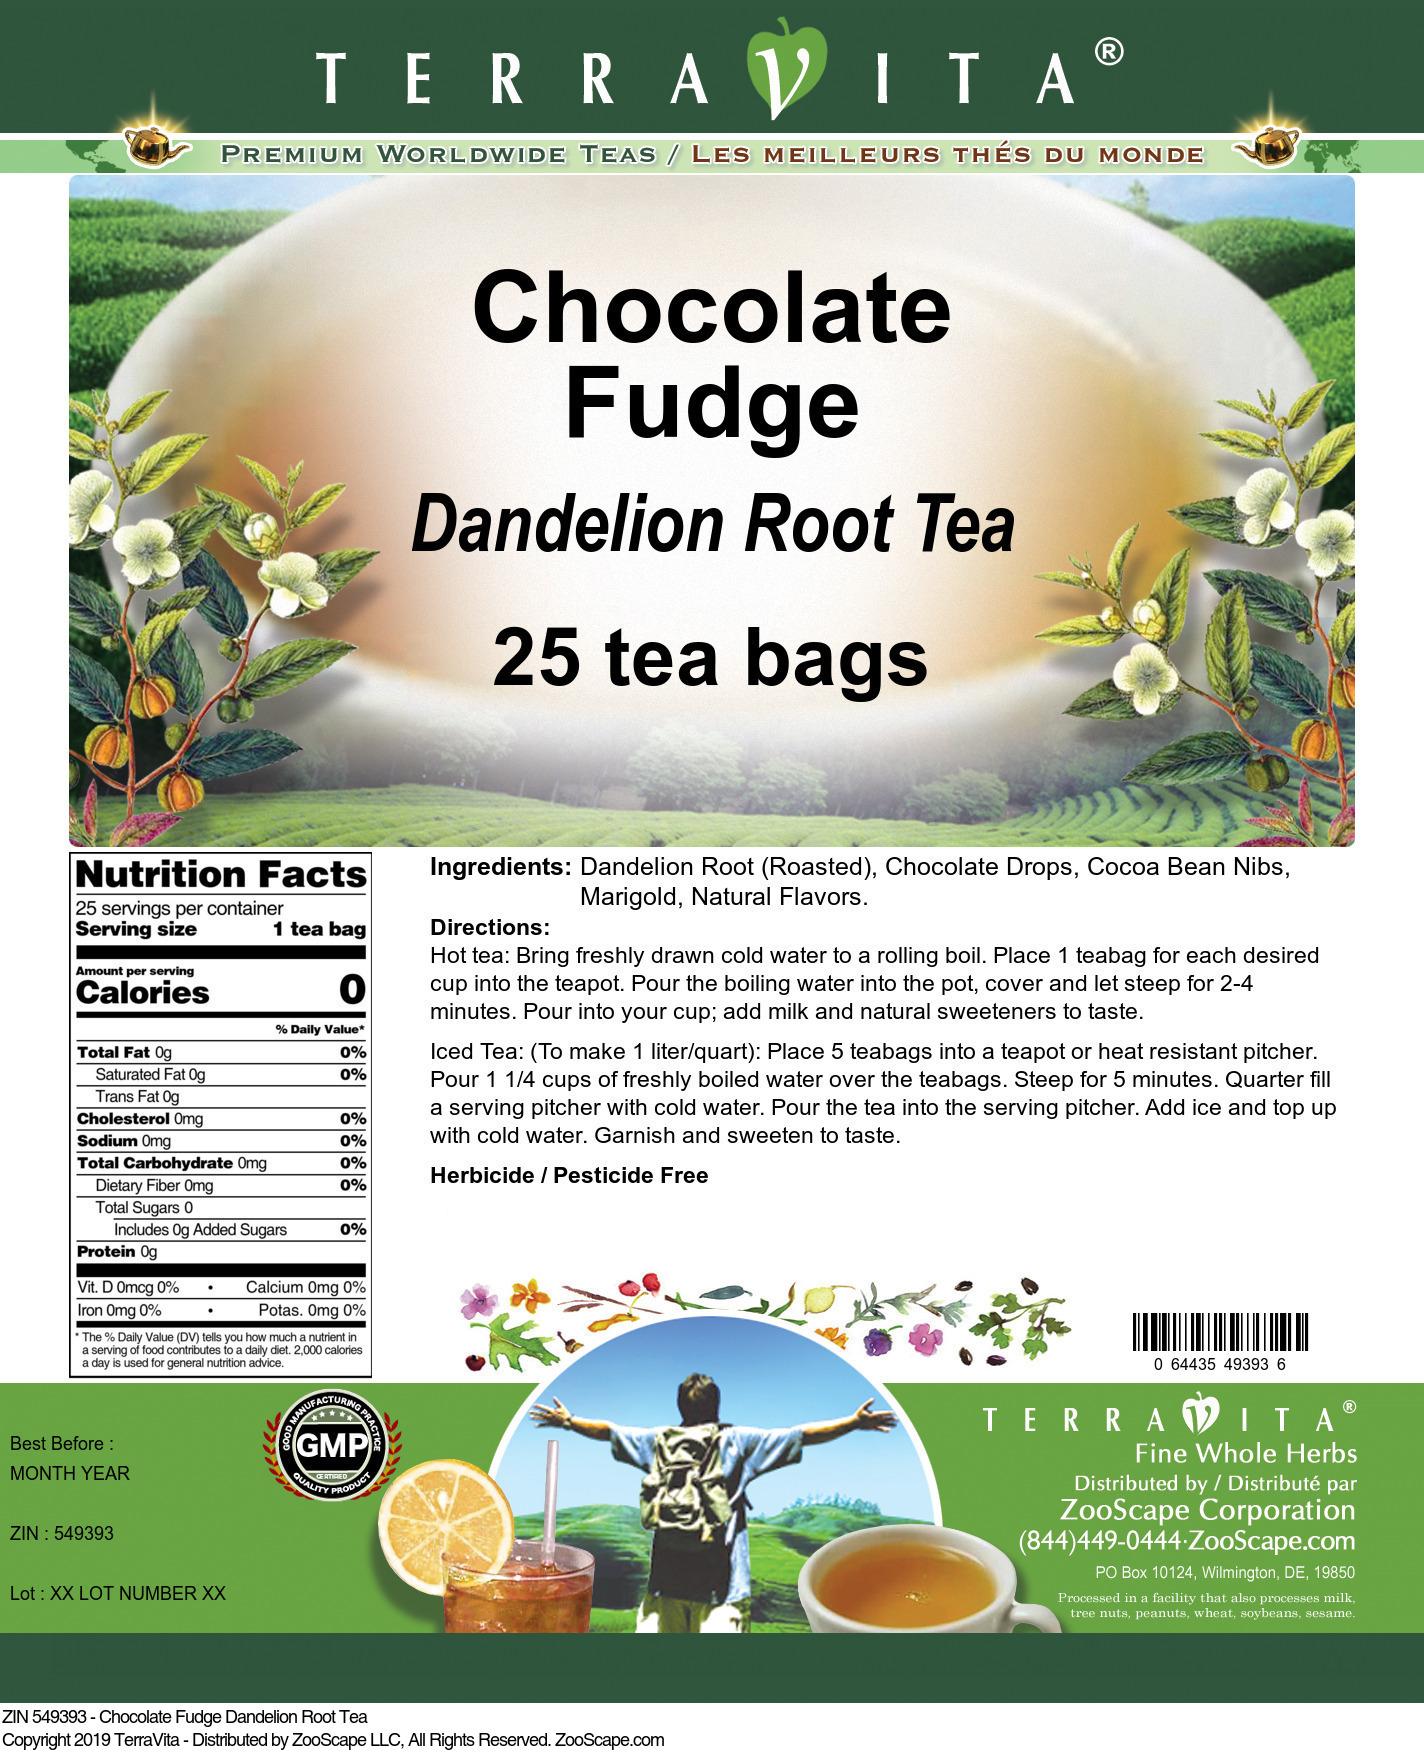 Chocolate Fudge Dandelion Root Tea